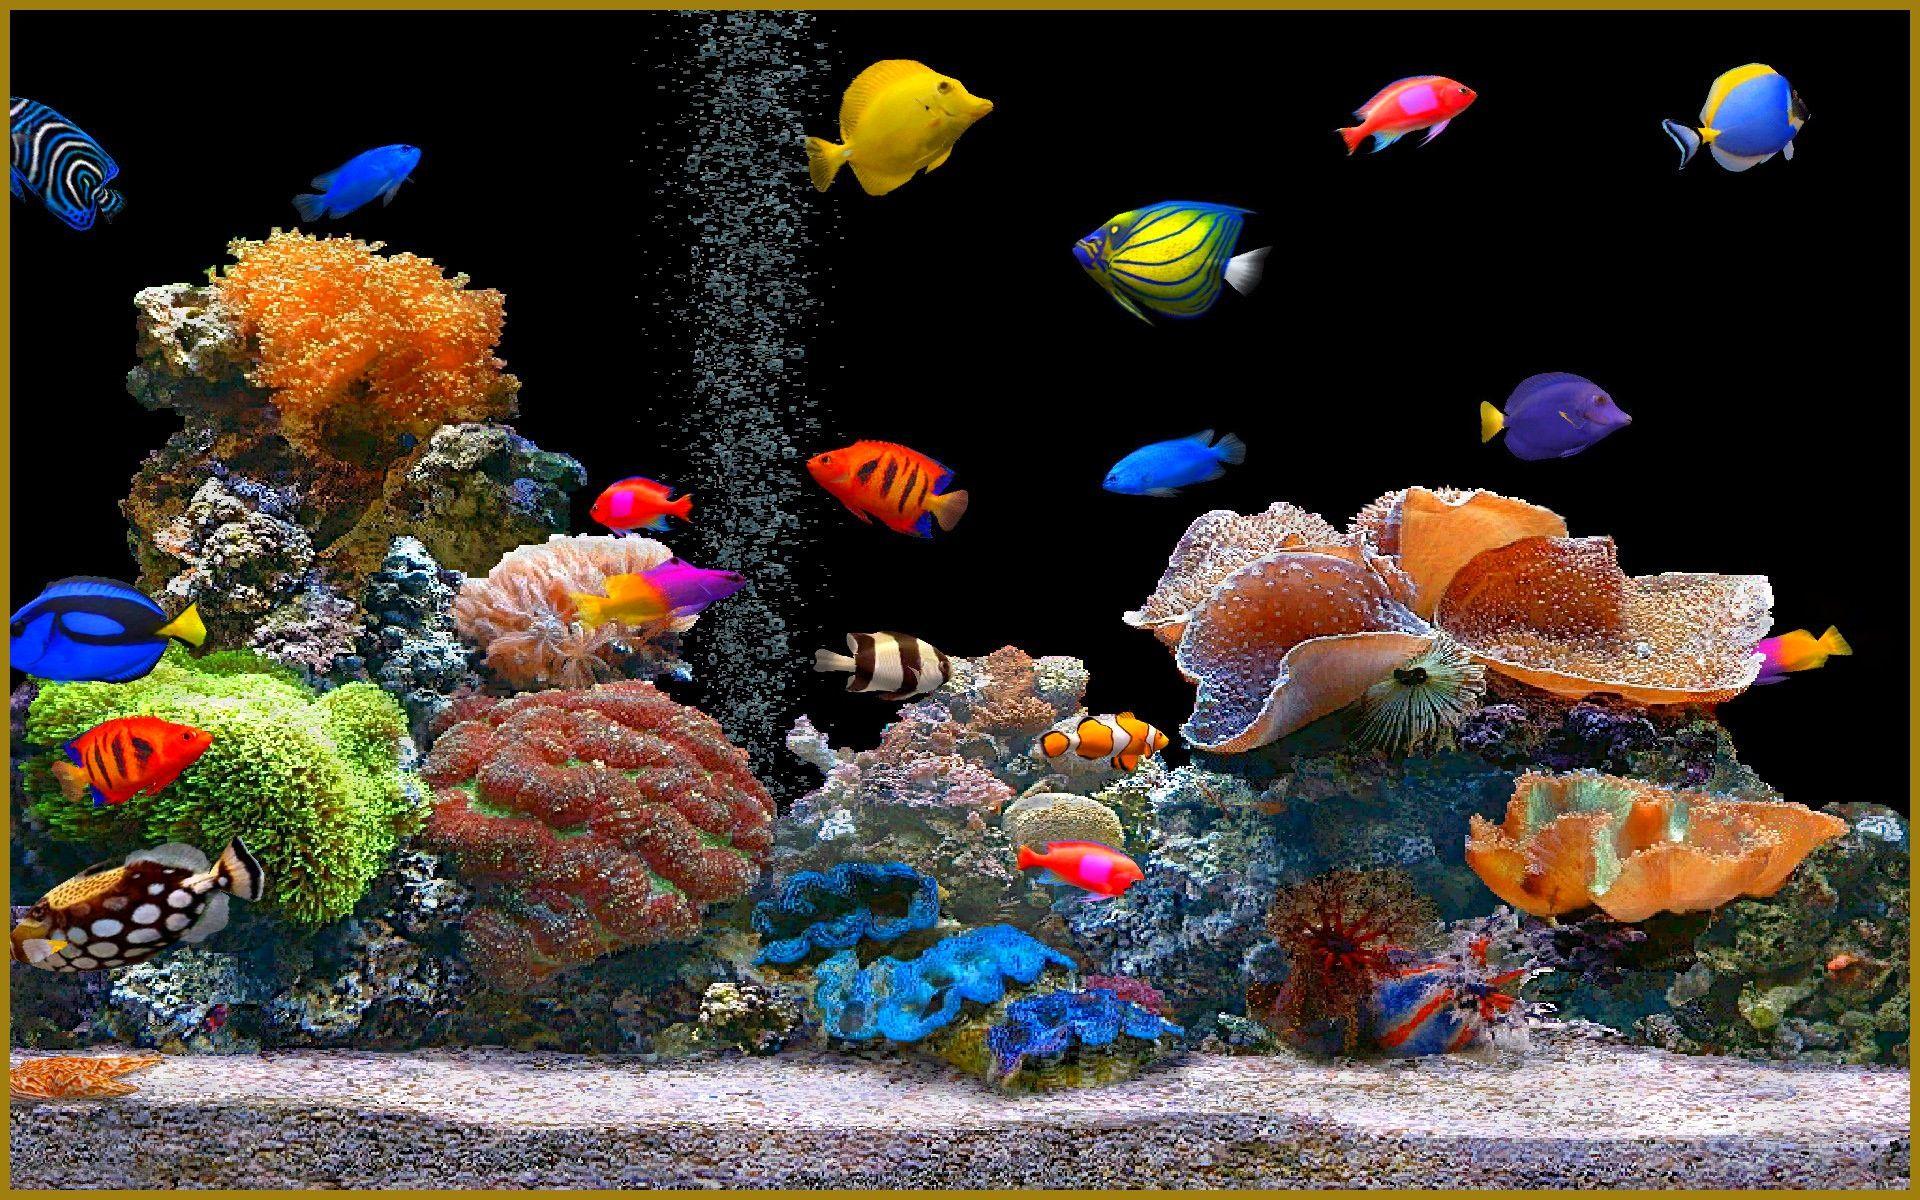 Online Store Of Carpet Aquarium Plants Fish Wallpaper Aquarium Live Wallpaper Saltwater Fish Tanks